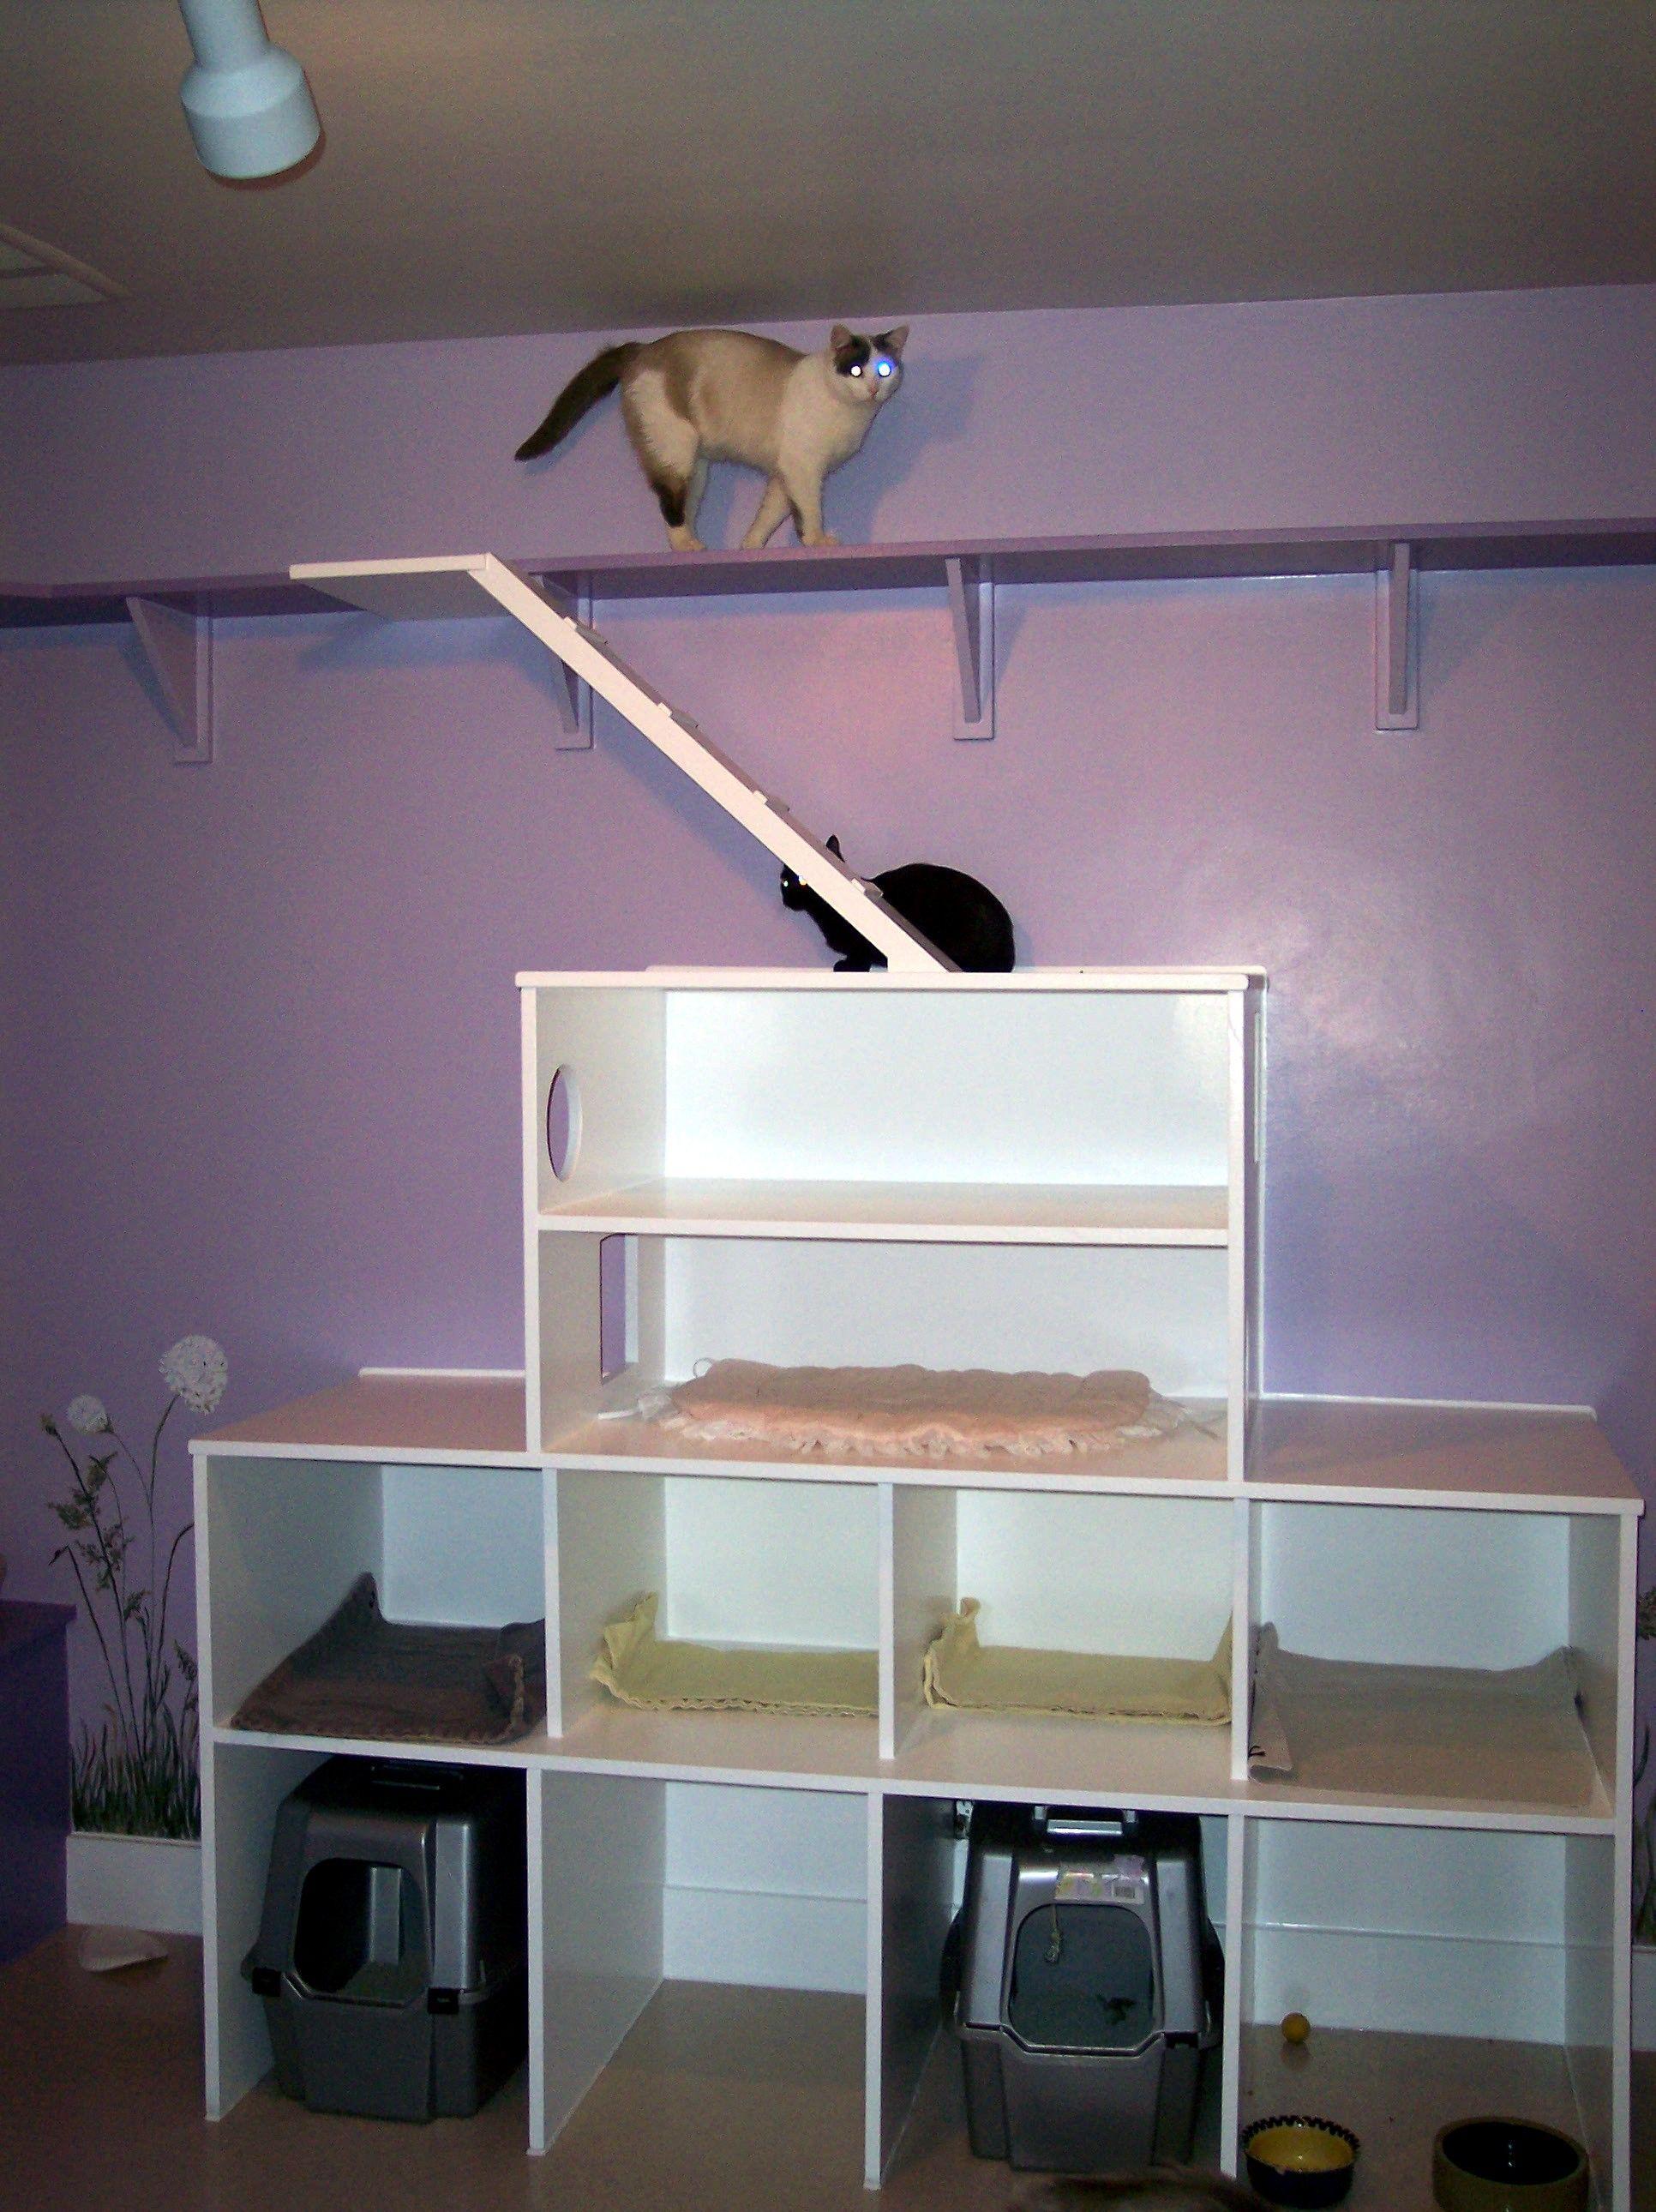 Random Cat Room Idea Haha My Cat Would Be In Heaven